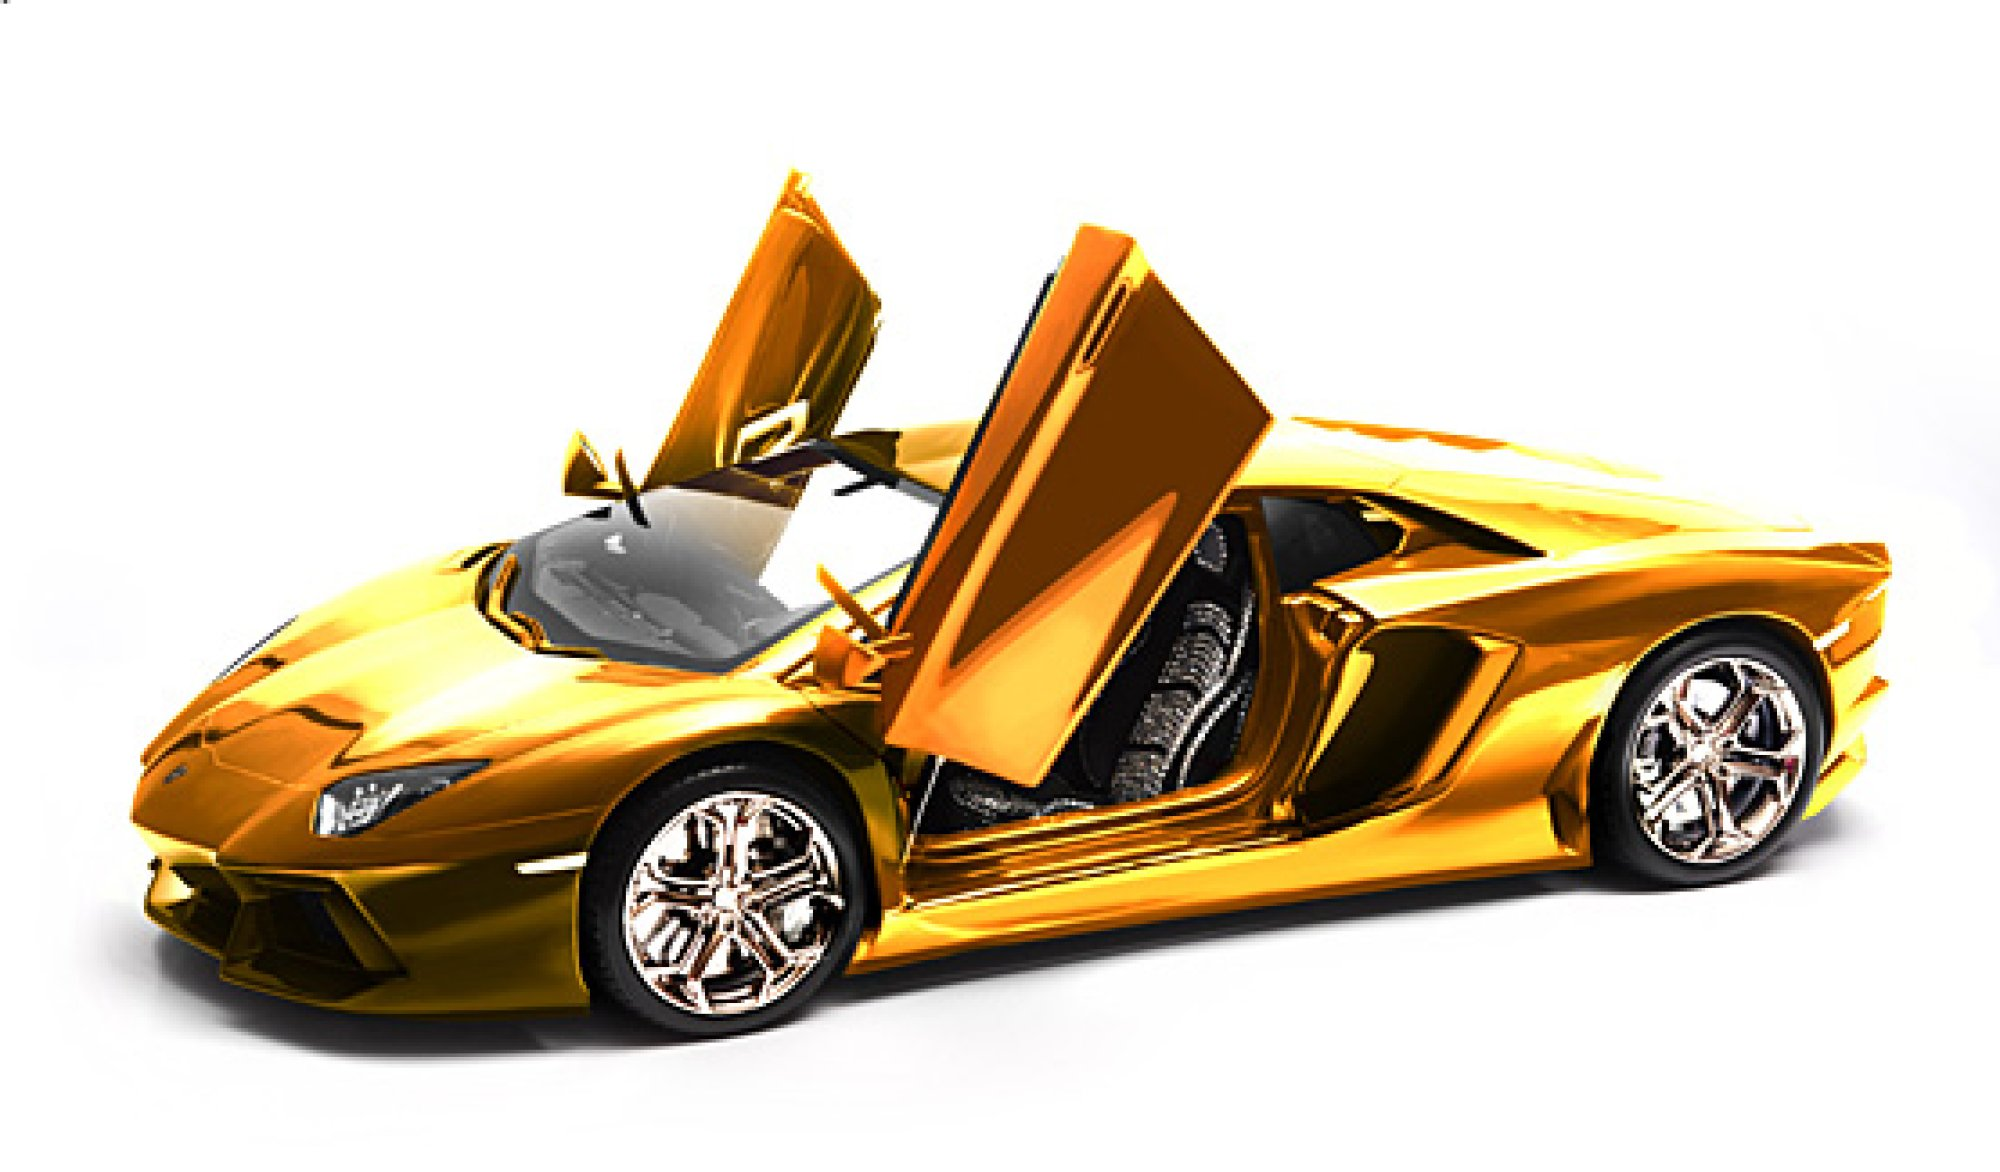 Lamborghini Alquiler venta renting coches de lujo en Barcelona